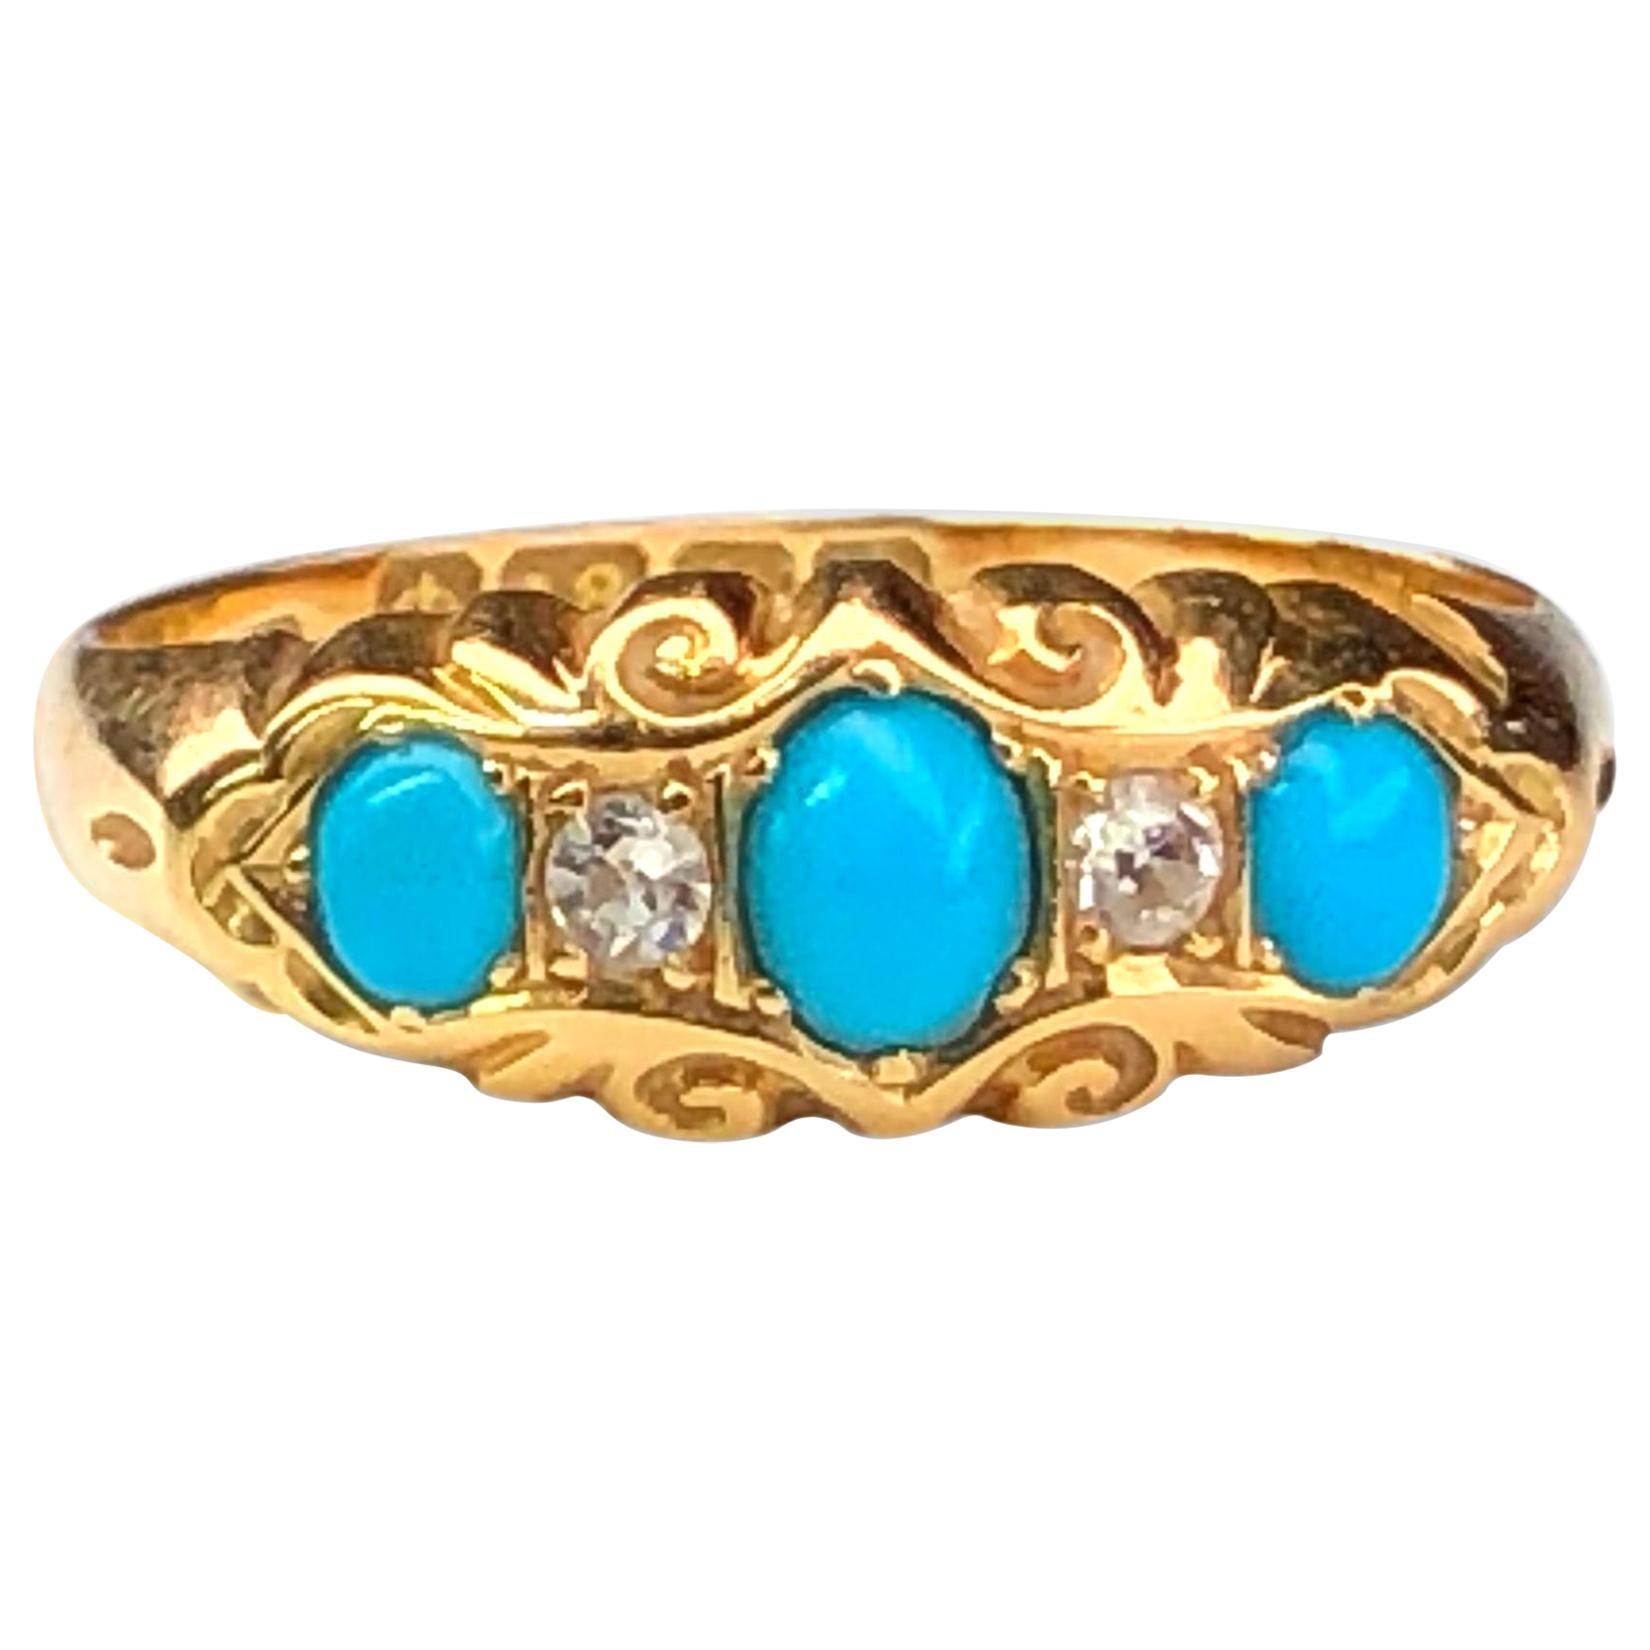 Edwardian Turquoise Diamond Five-Stone Antique Ring